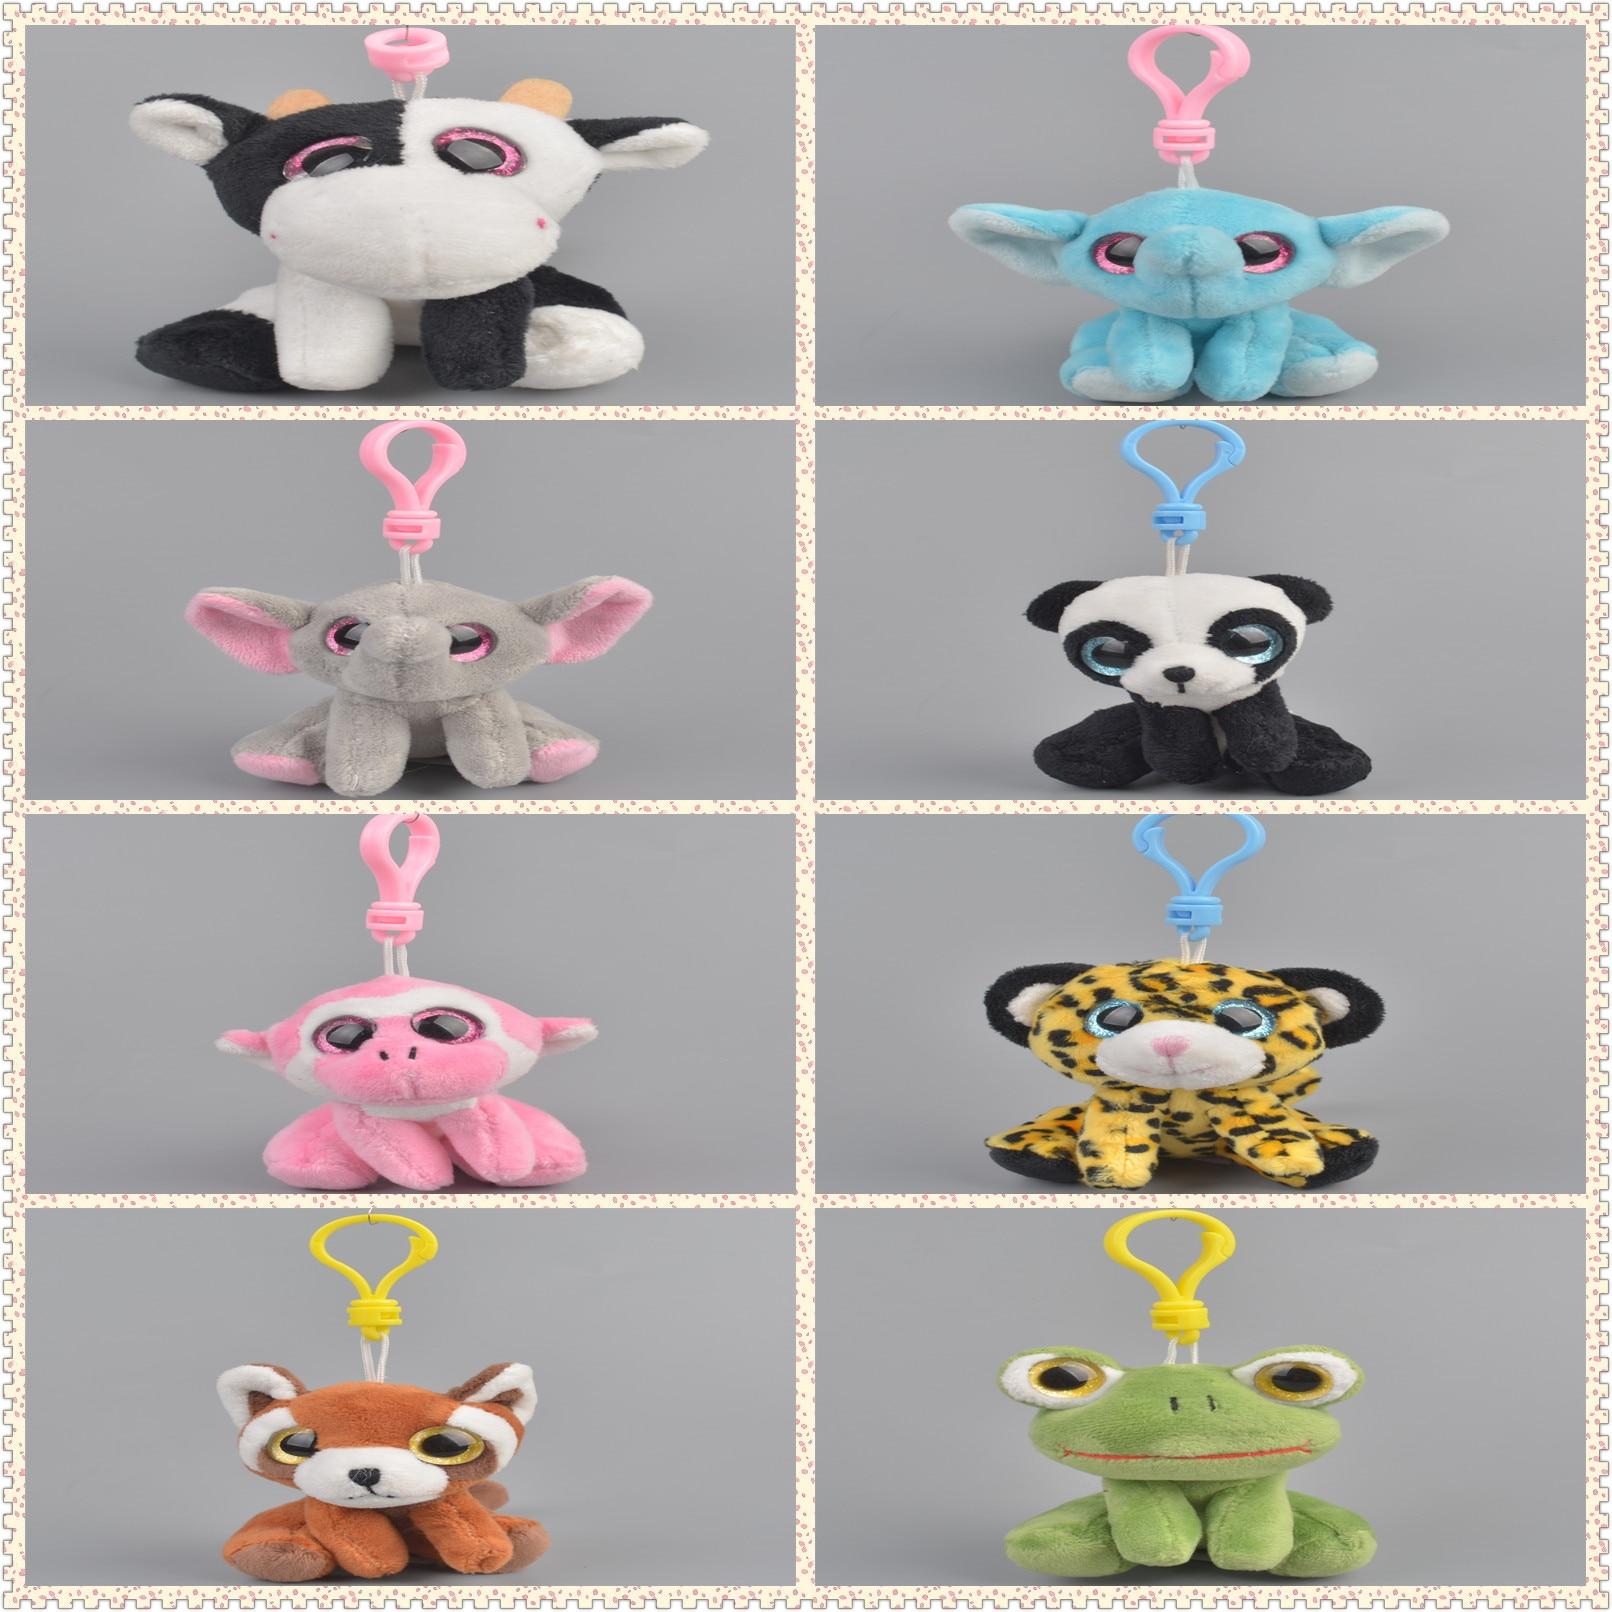 Boos Big Eyes Plush Keychain Toy Doll Fox Owl Dog Unicorn Penguin Giraffe Leopard Monkey Dragon(China)